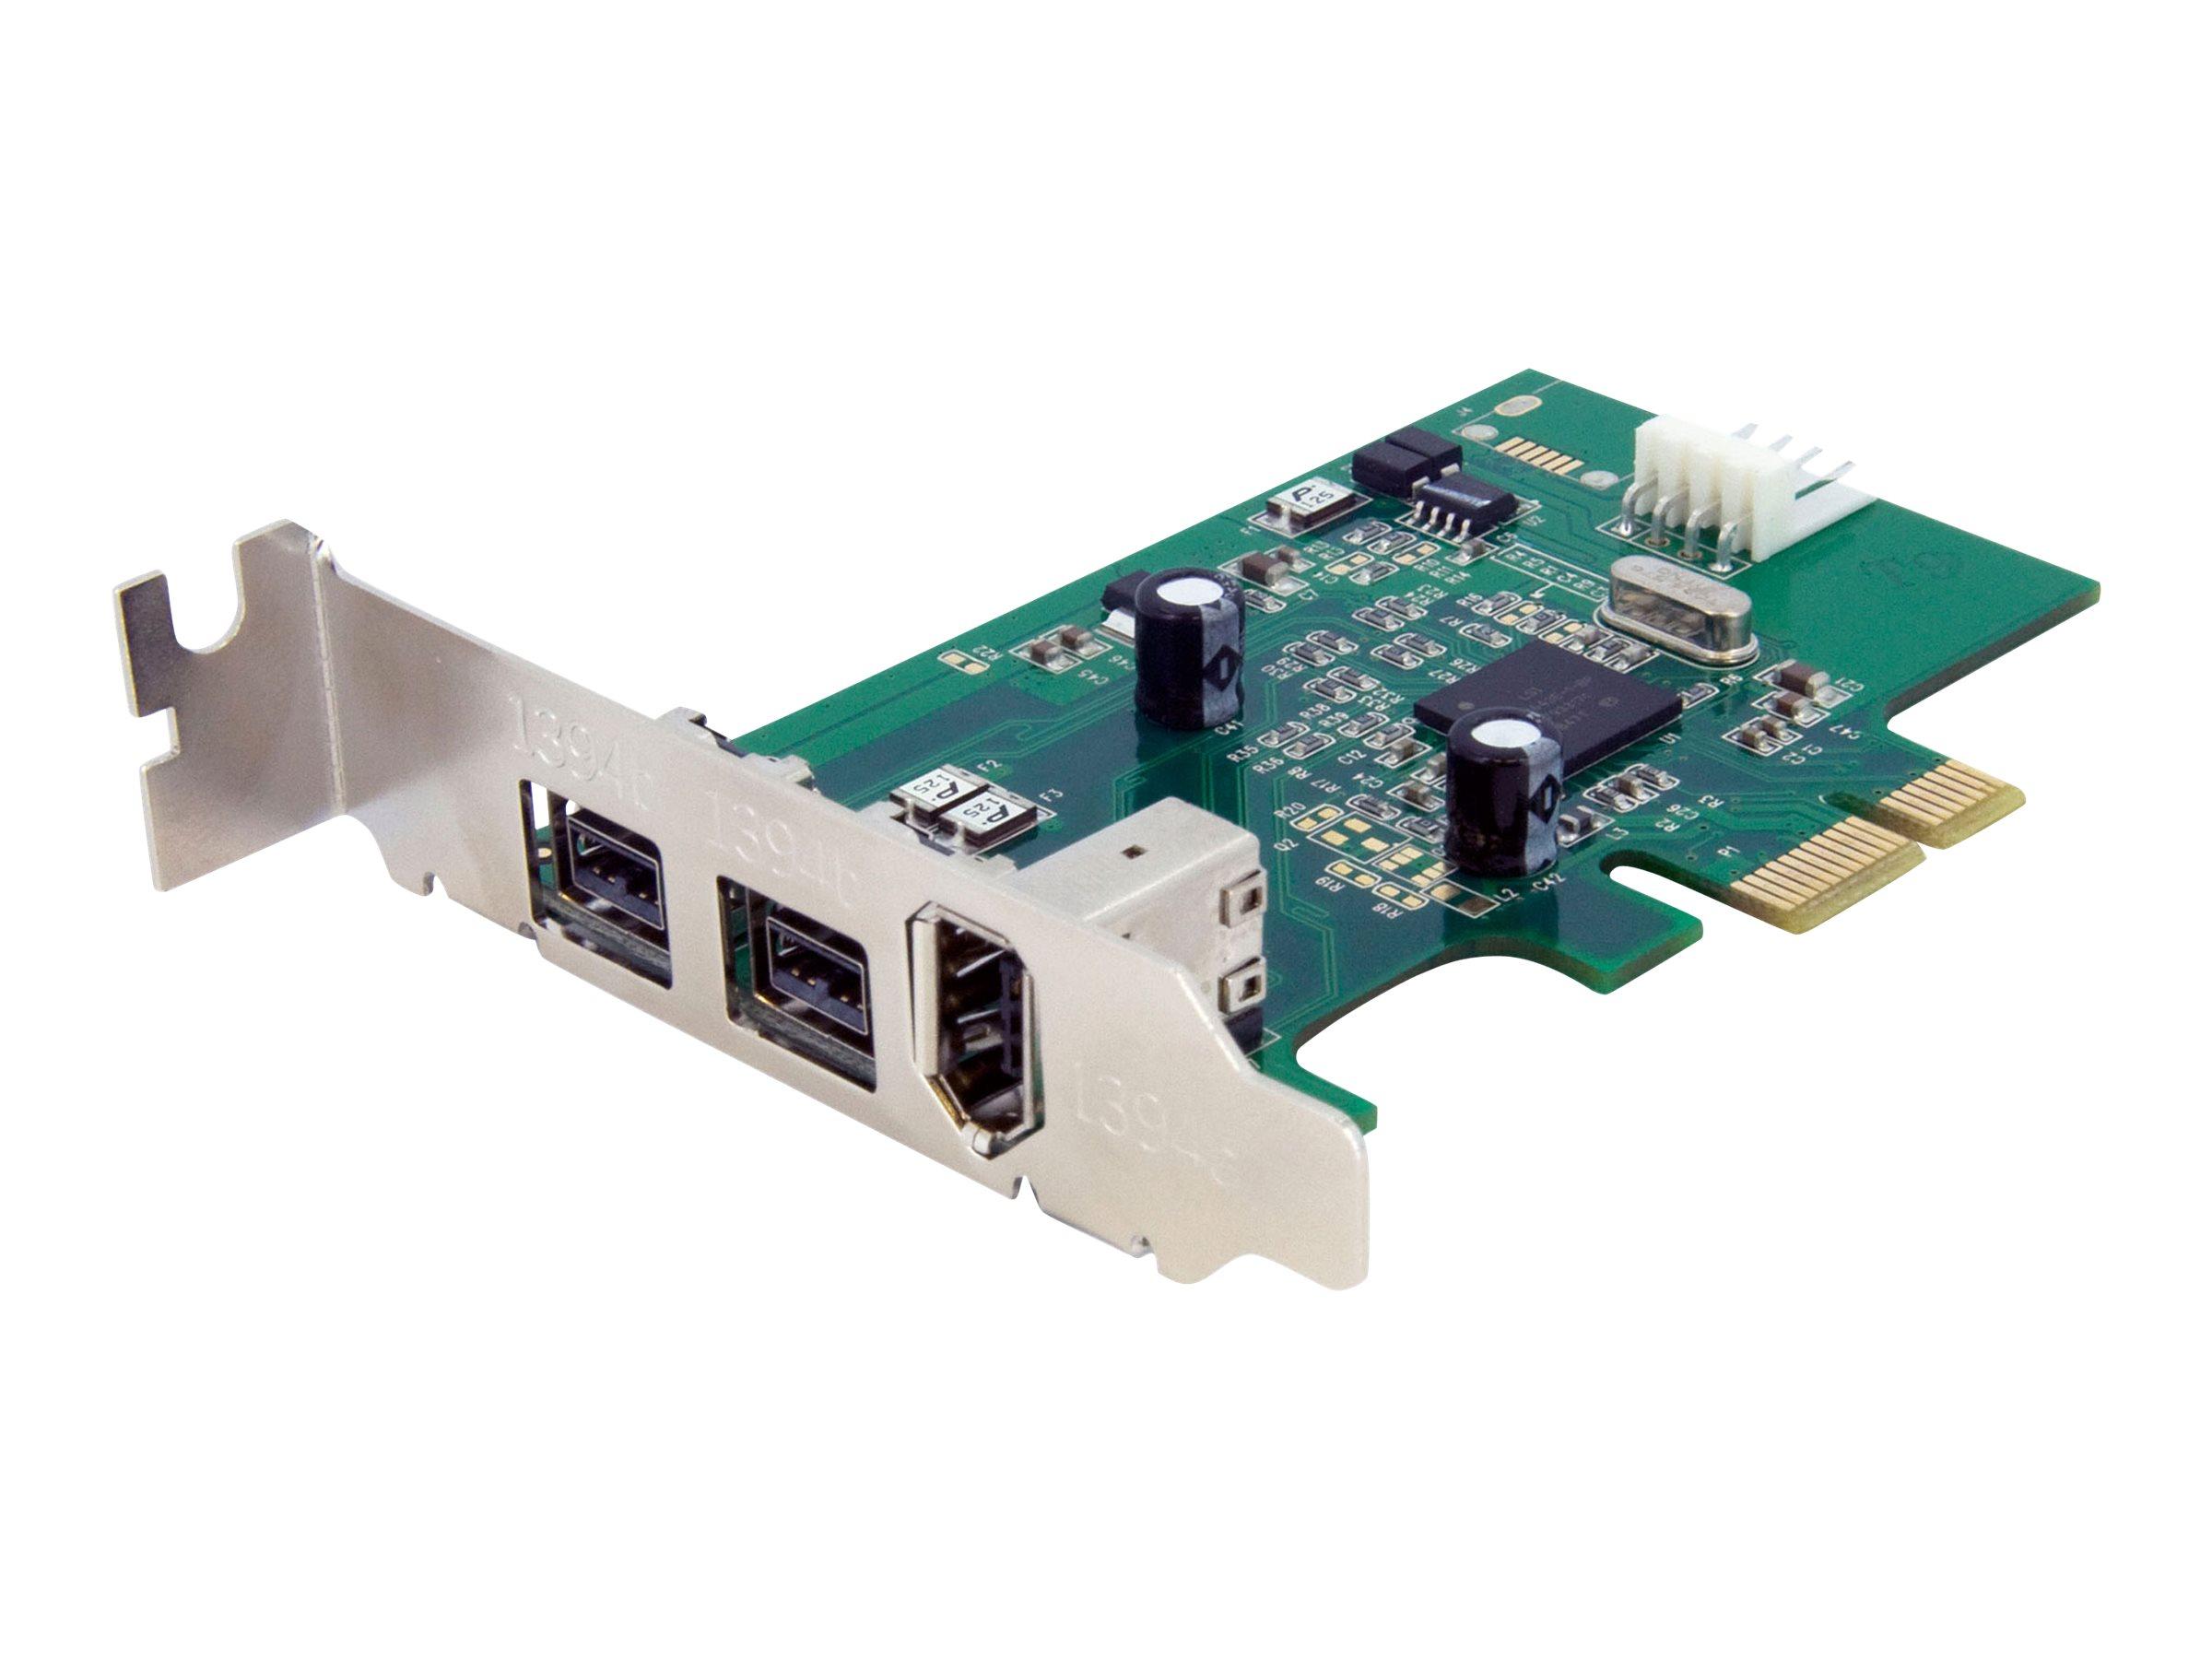 StarTech.com 3 Port 800+400 FireWire PCI Express Schnittstellen Low Profile Combo Karte - PCIe 3 Port FireWire Card - PCI-e 1 x